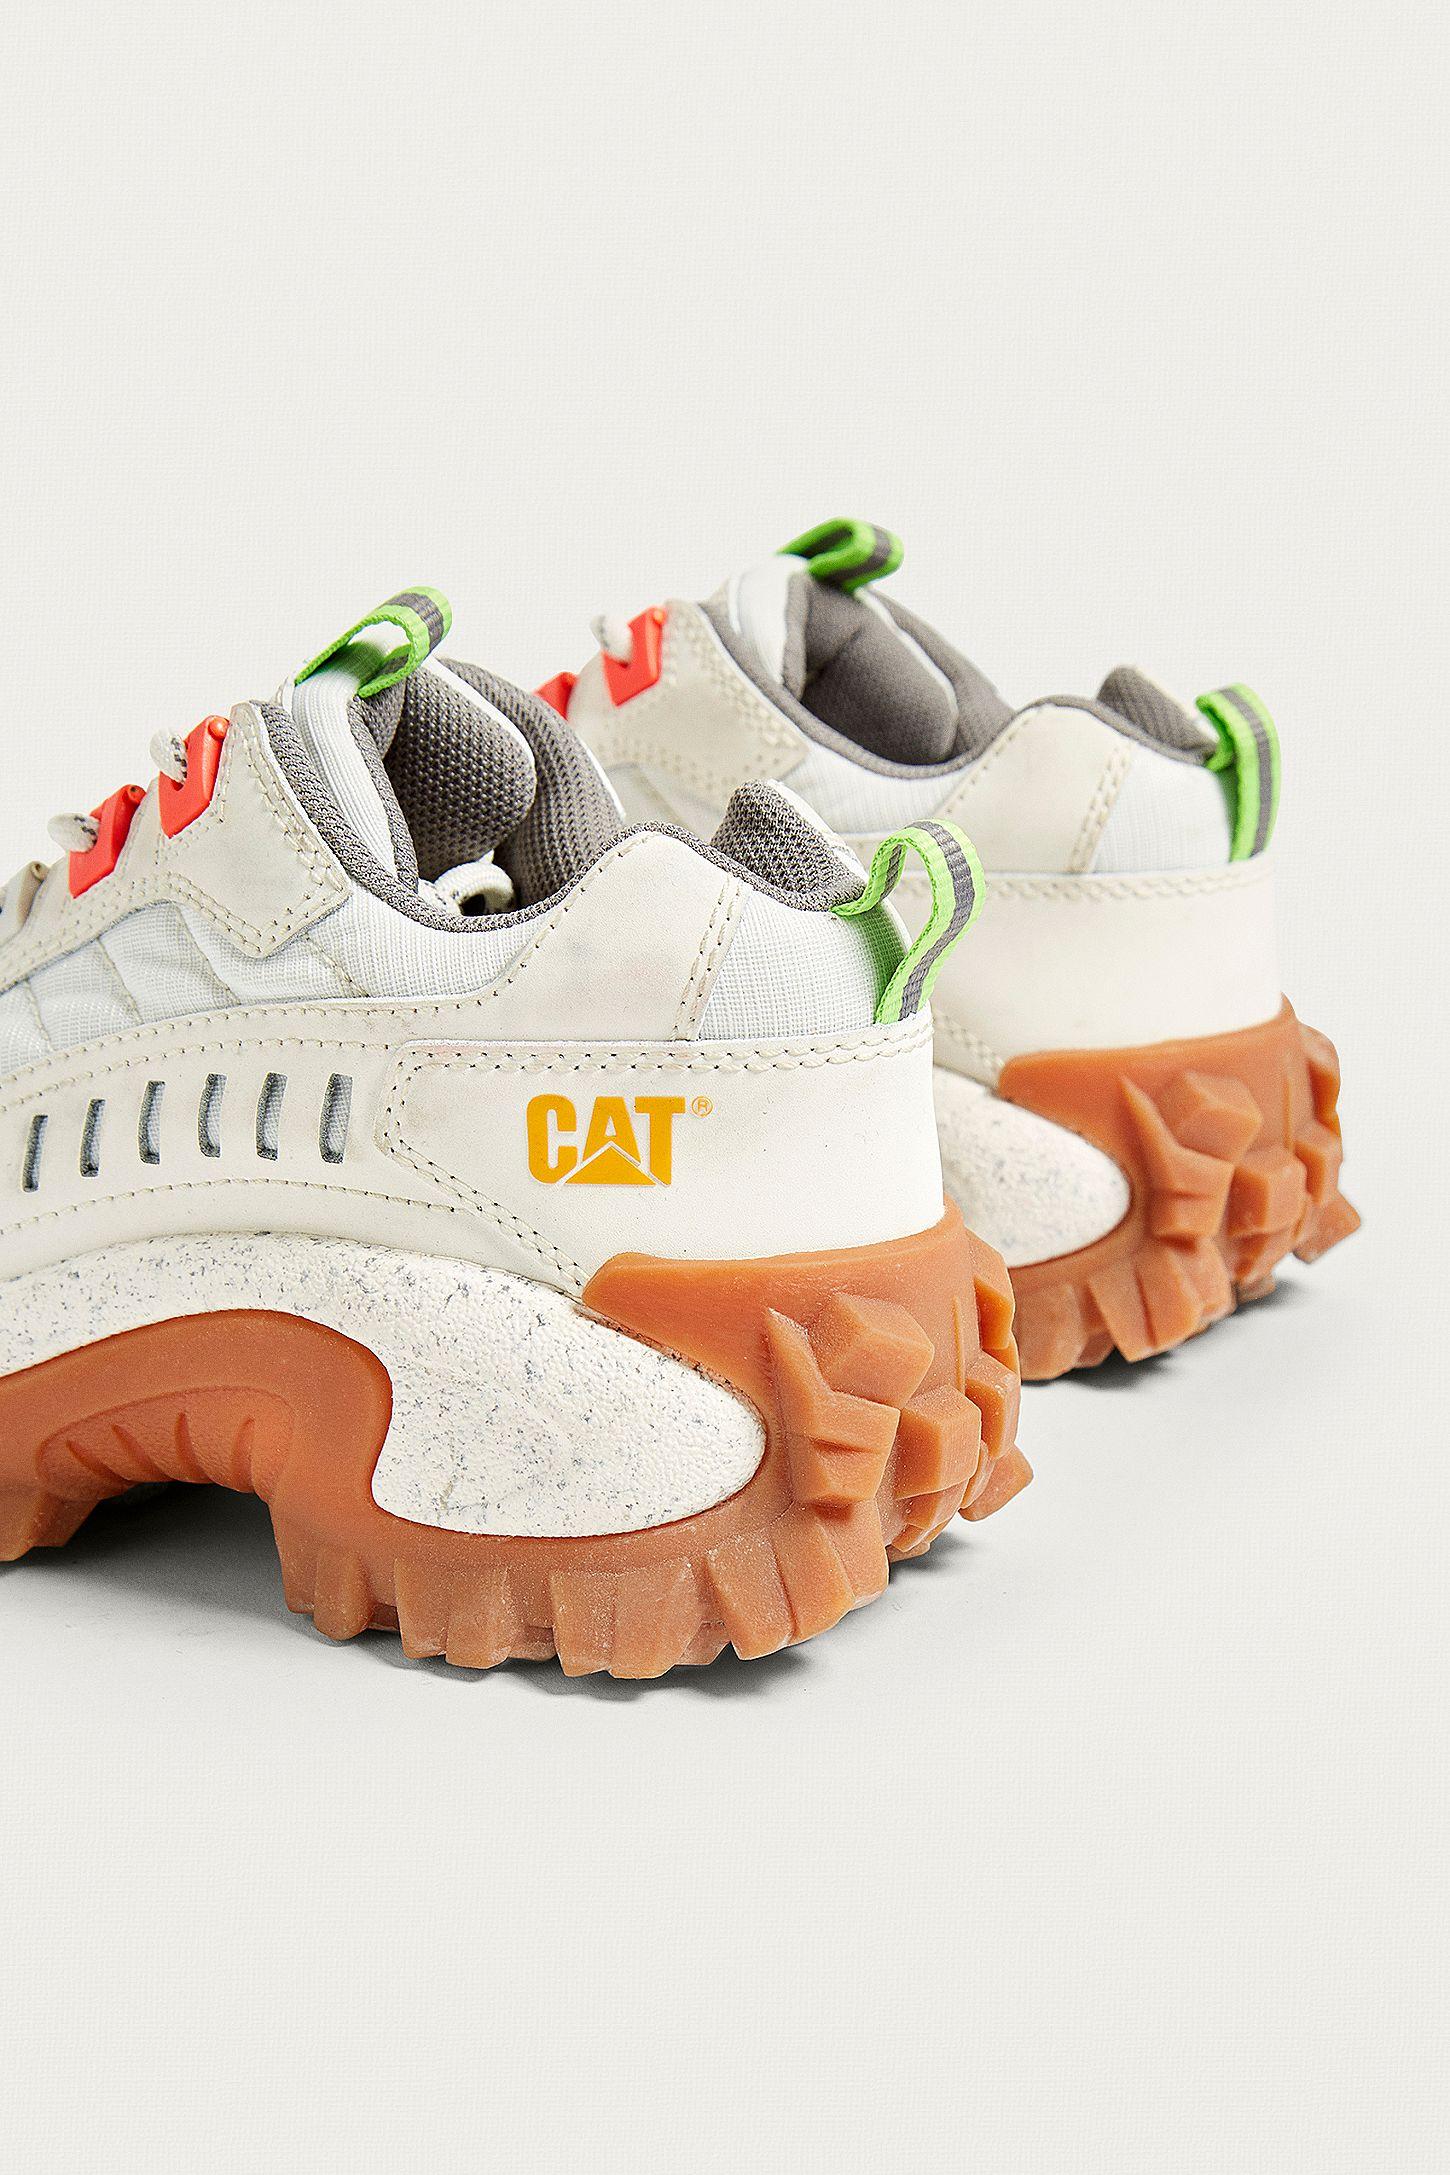 Baskets Cat BlanchesUrban Fr Outfitters Footwear Intruder E2H9DIW